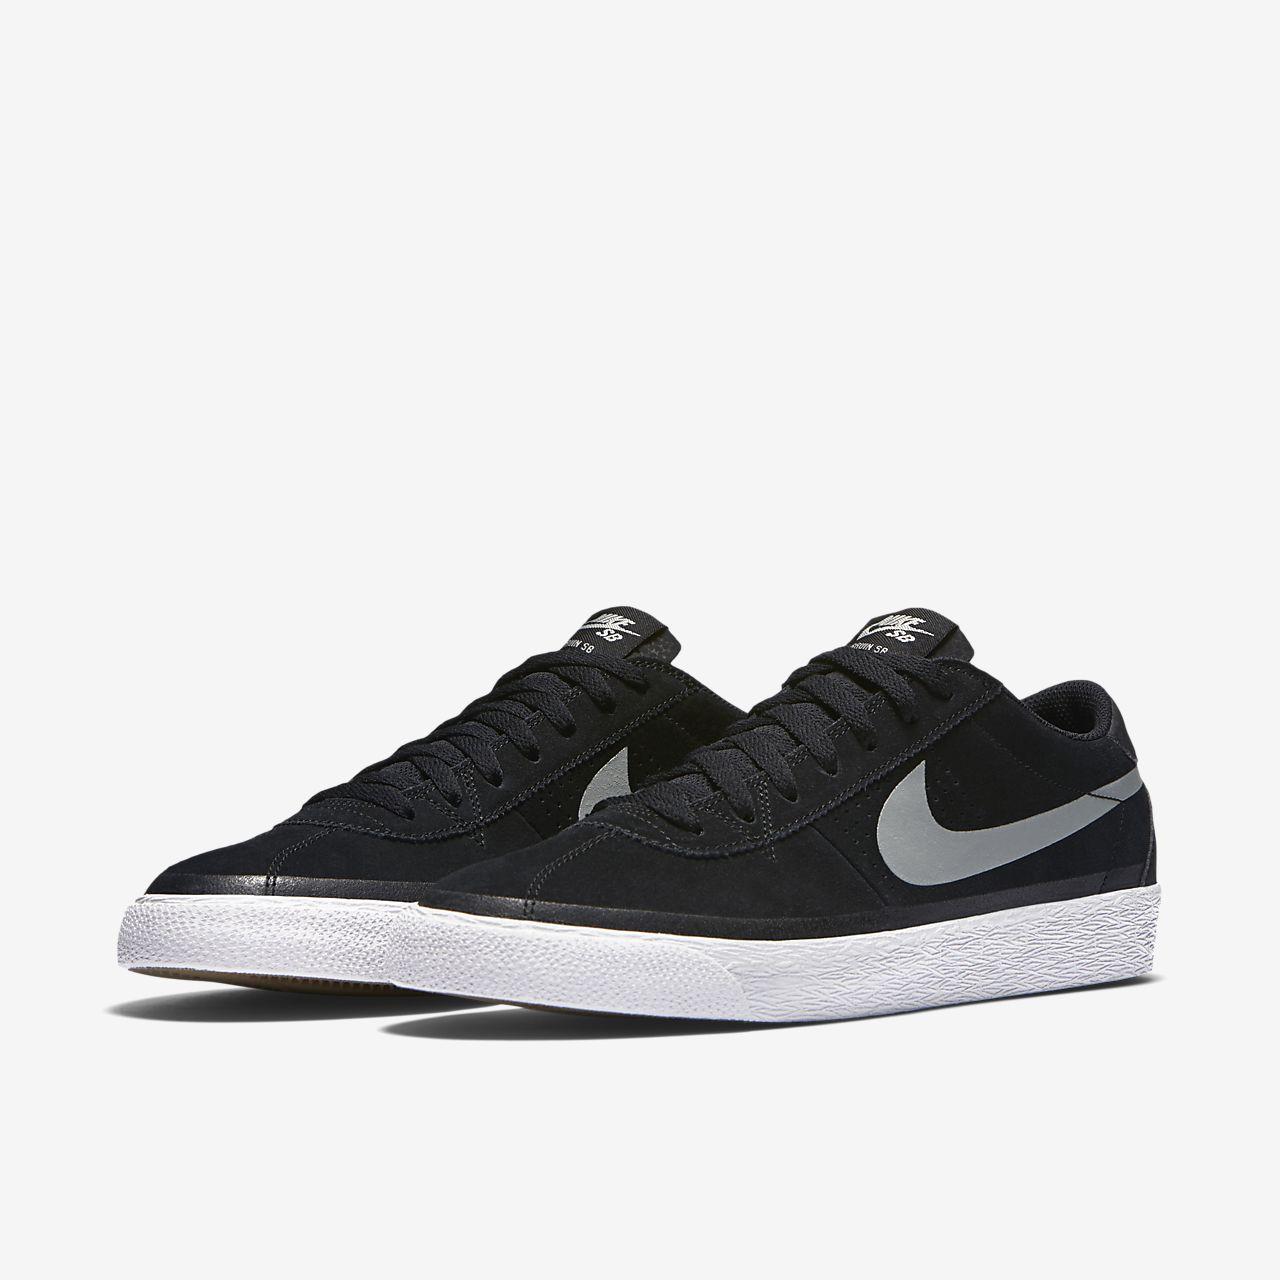 save off 858a5 acbf7 Nike SB Zoom Bruin Mens Skateboarding Shoe